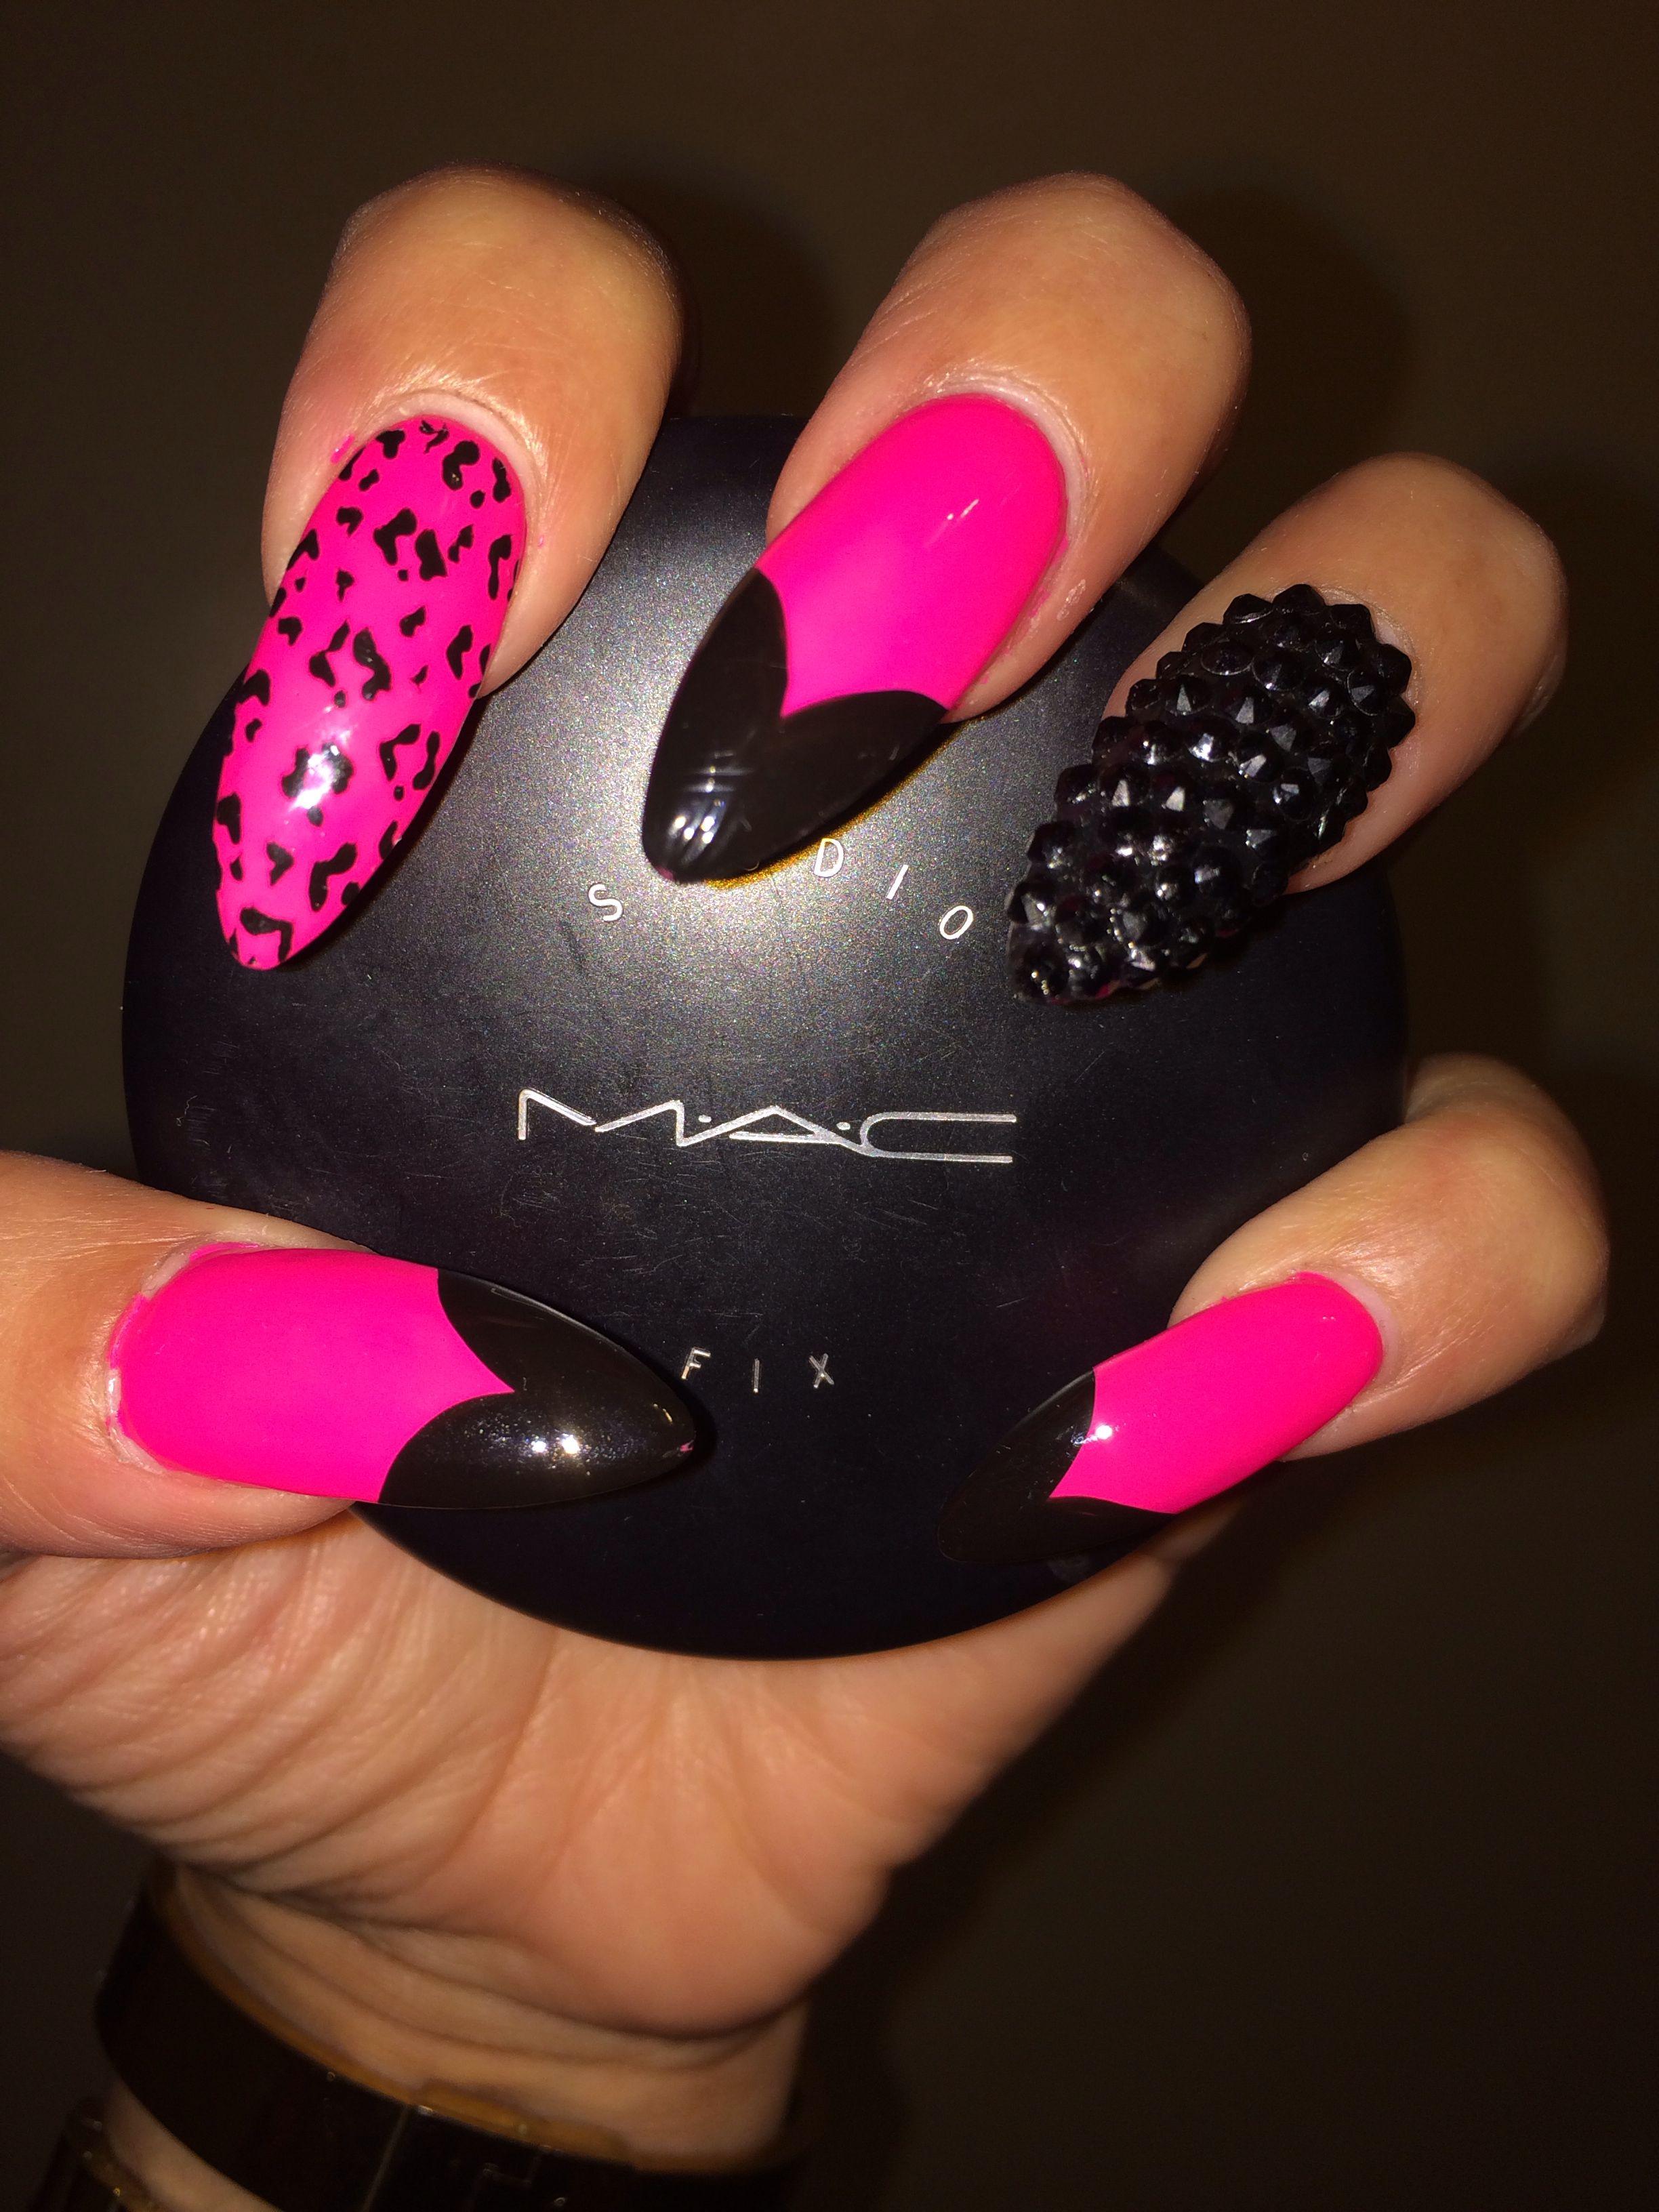 Pink & black stiletto nails | Nail Designs | Pinterest